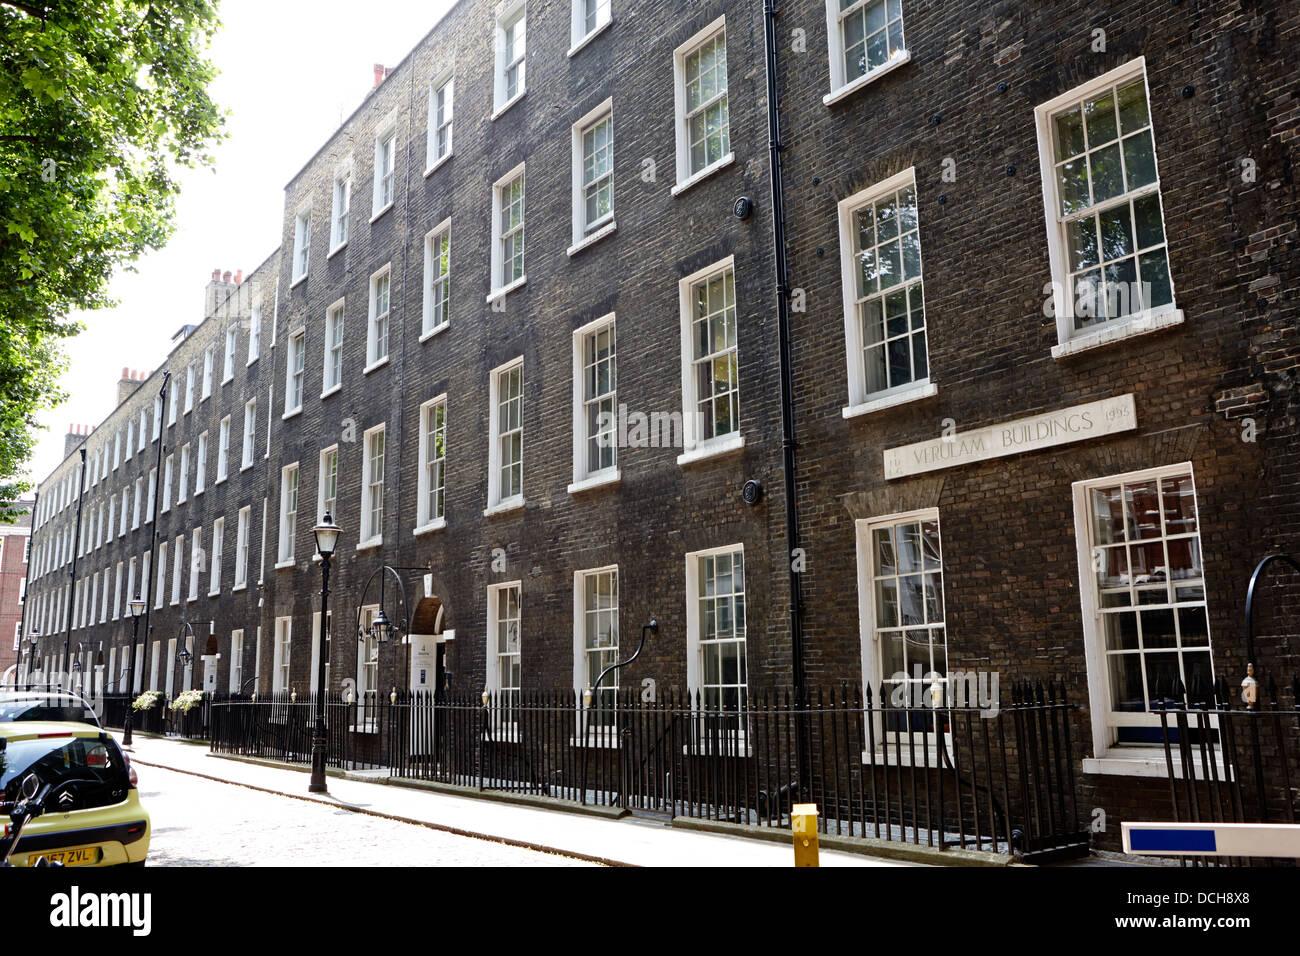 verulam buildings grays inn London England UK - Stock Image